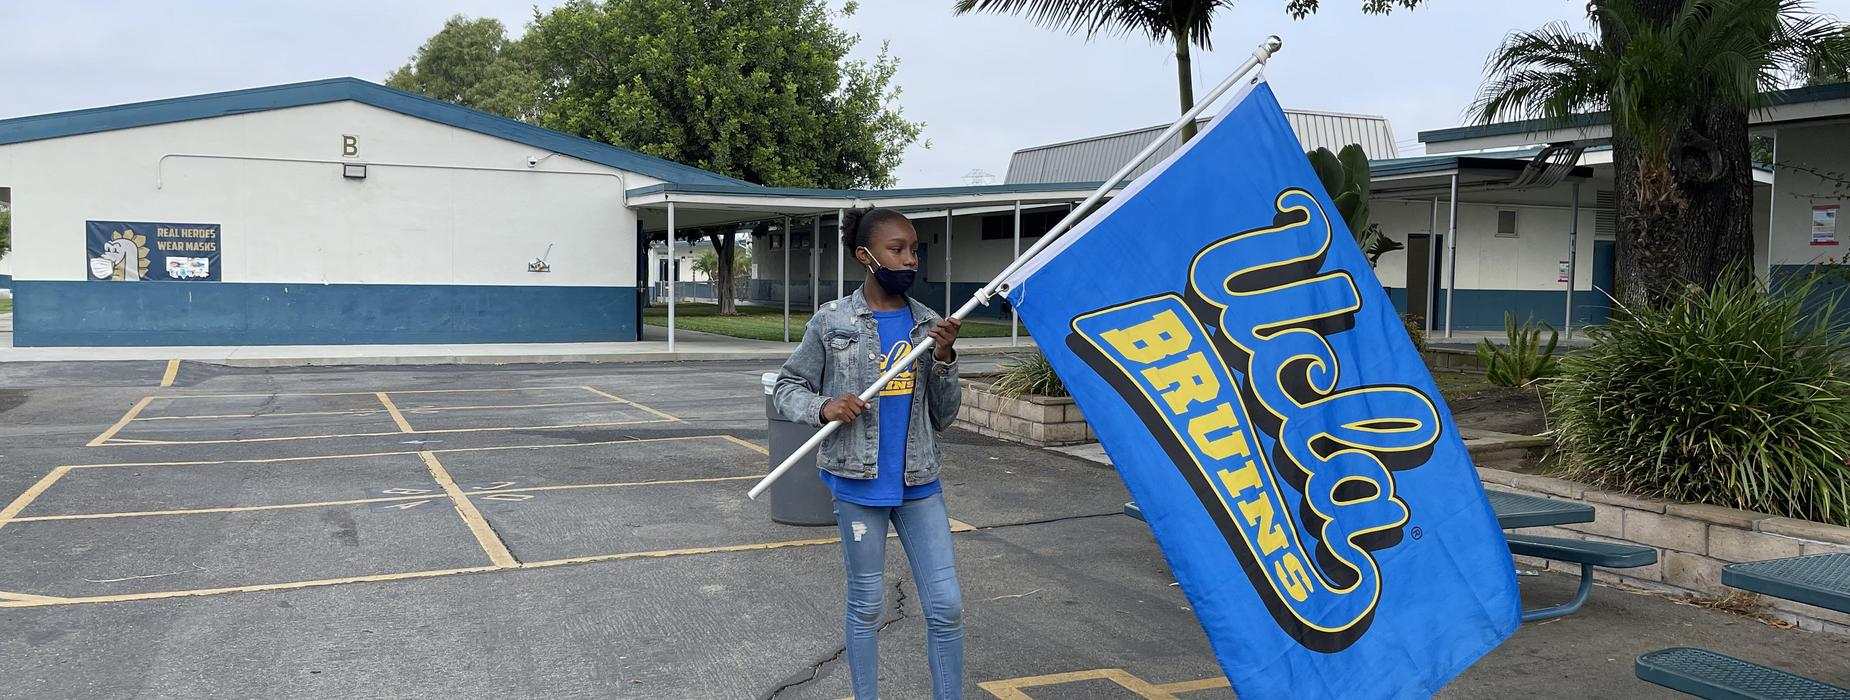 UCLA flag and student